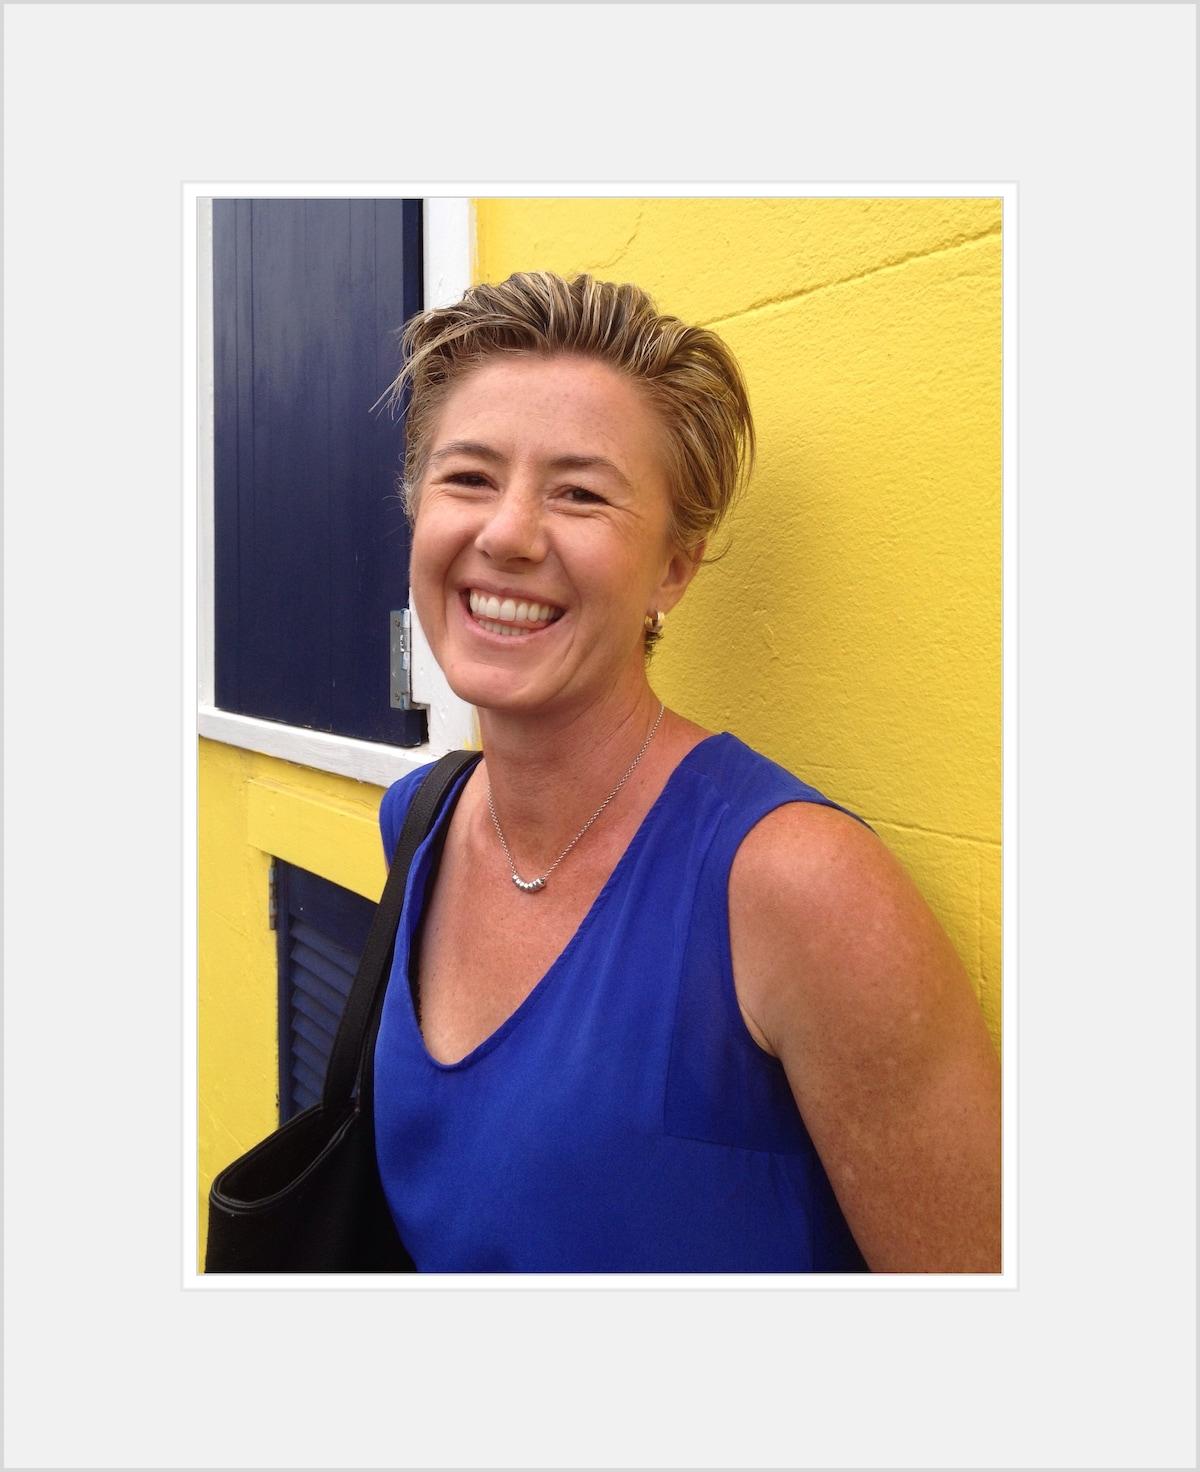 Jodie From Balmain, Australia